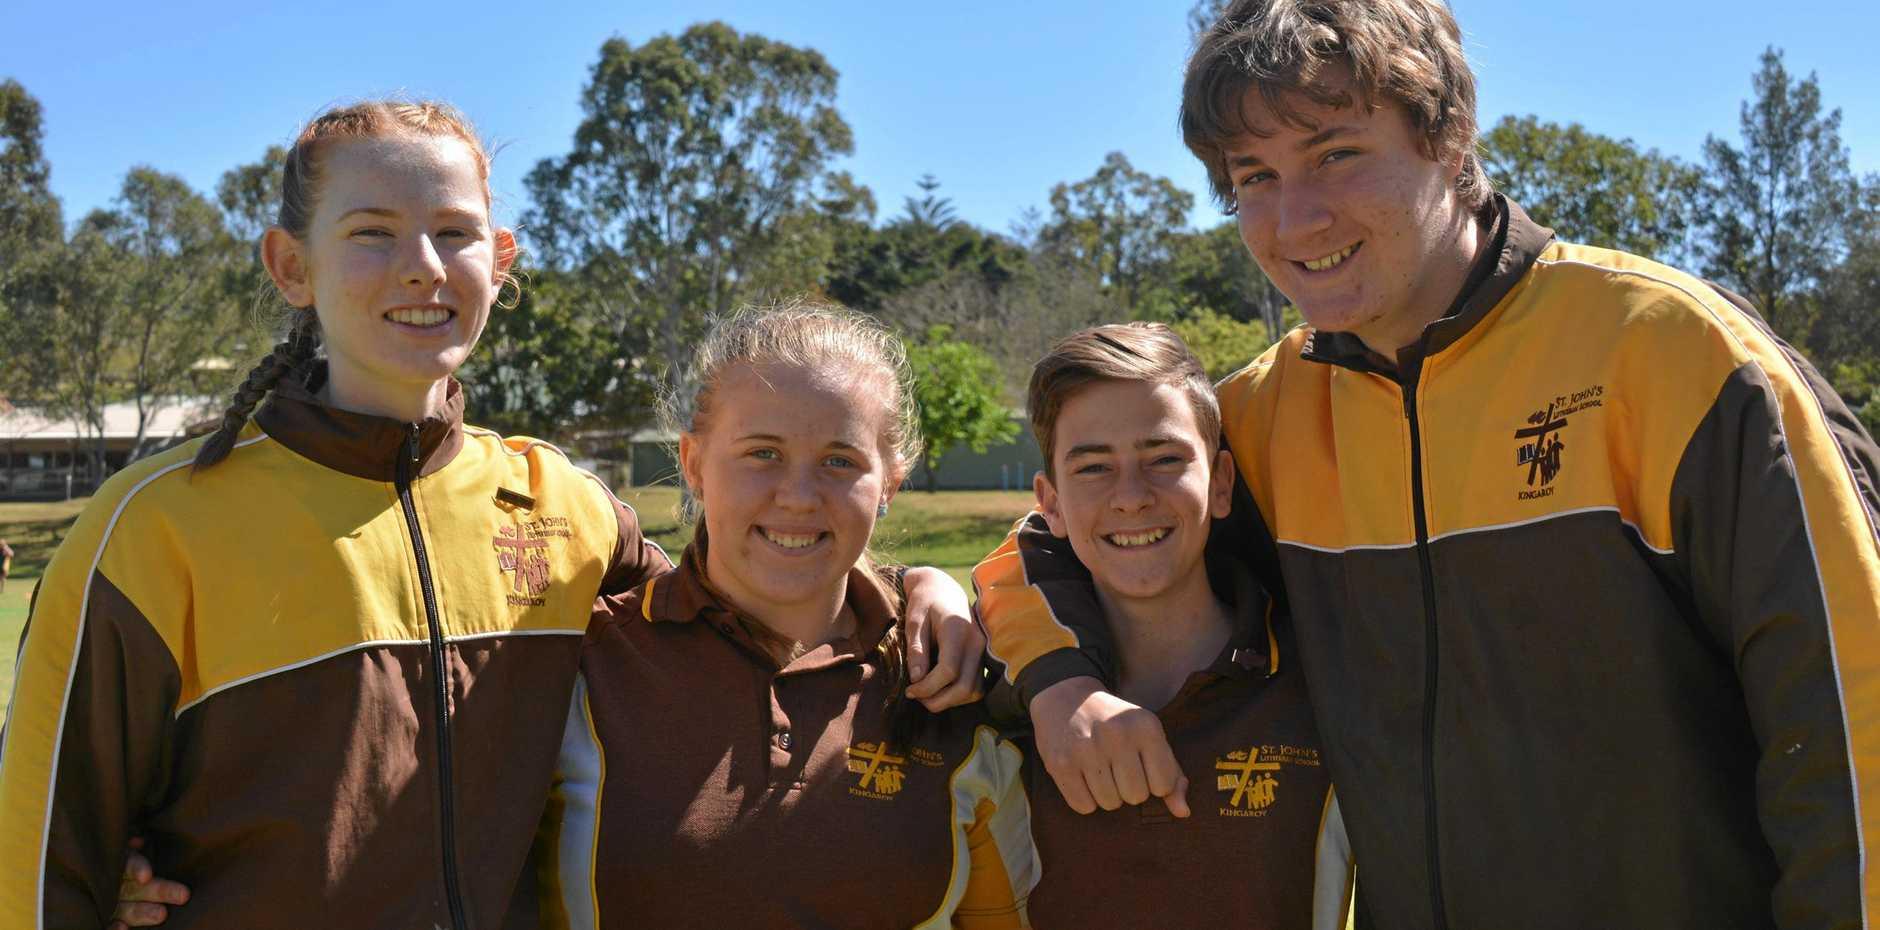 St Johns teachers were nominated amongst others: Emma Wilks, Chloe Black, Hugh Wyvill, and Isaac Jones.